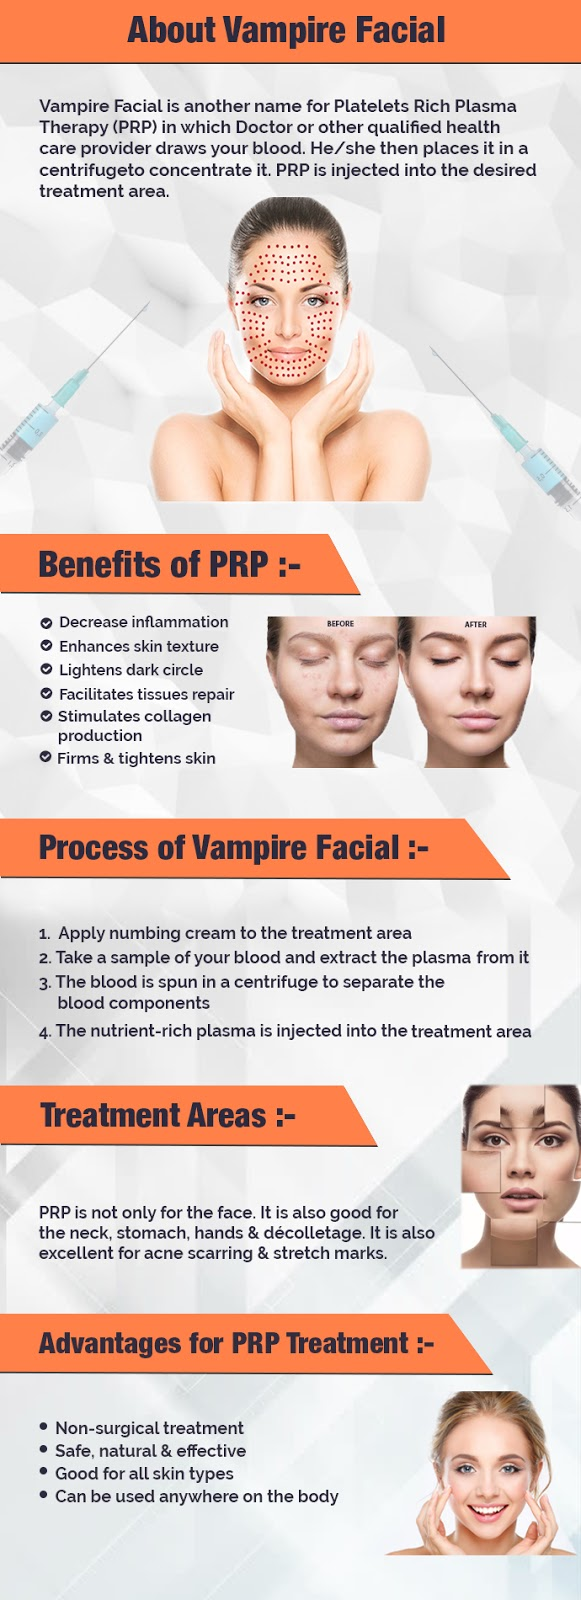 About Vampire Facial